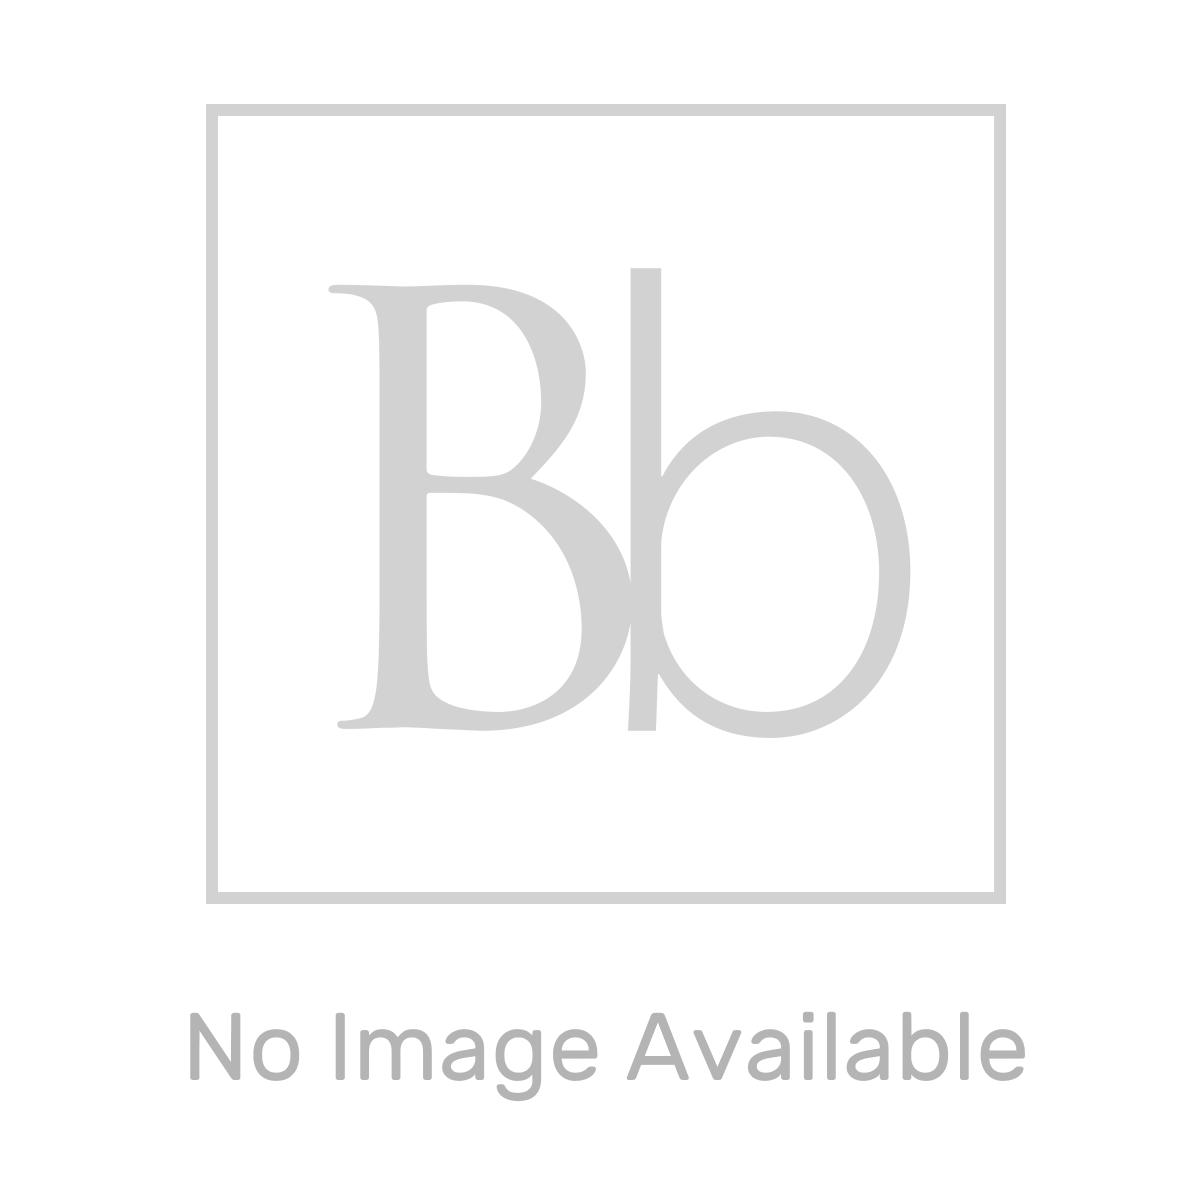 Mito Wall Hung Vanity Unit 750mm Lifestyle